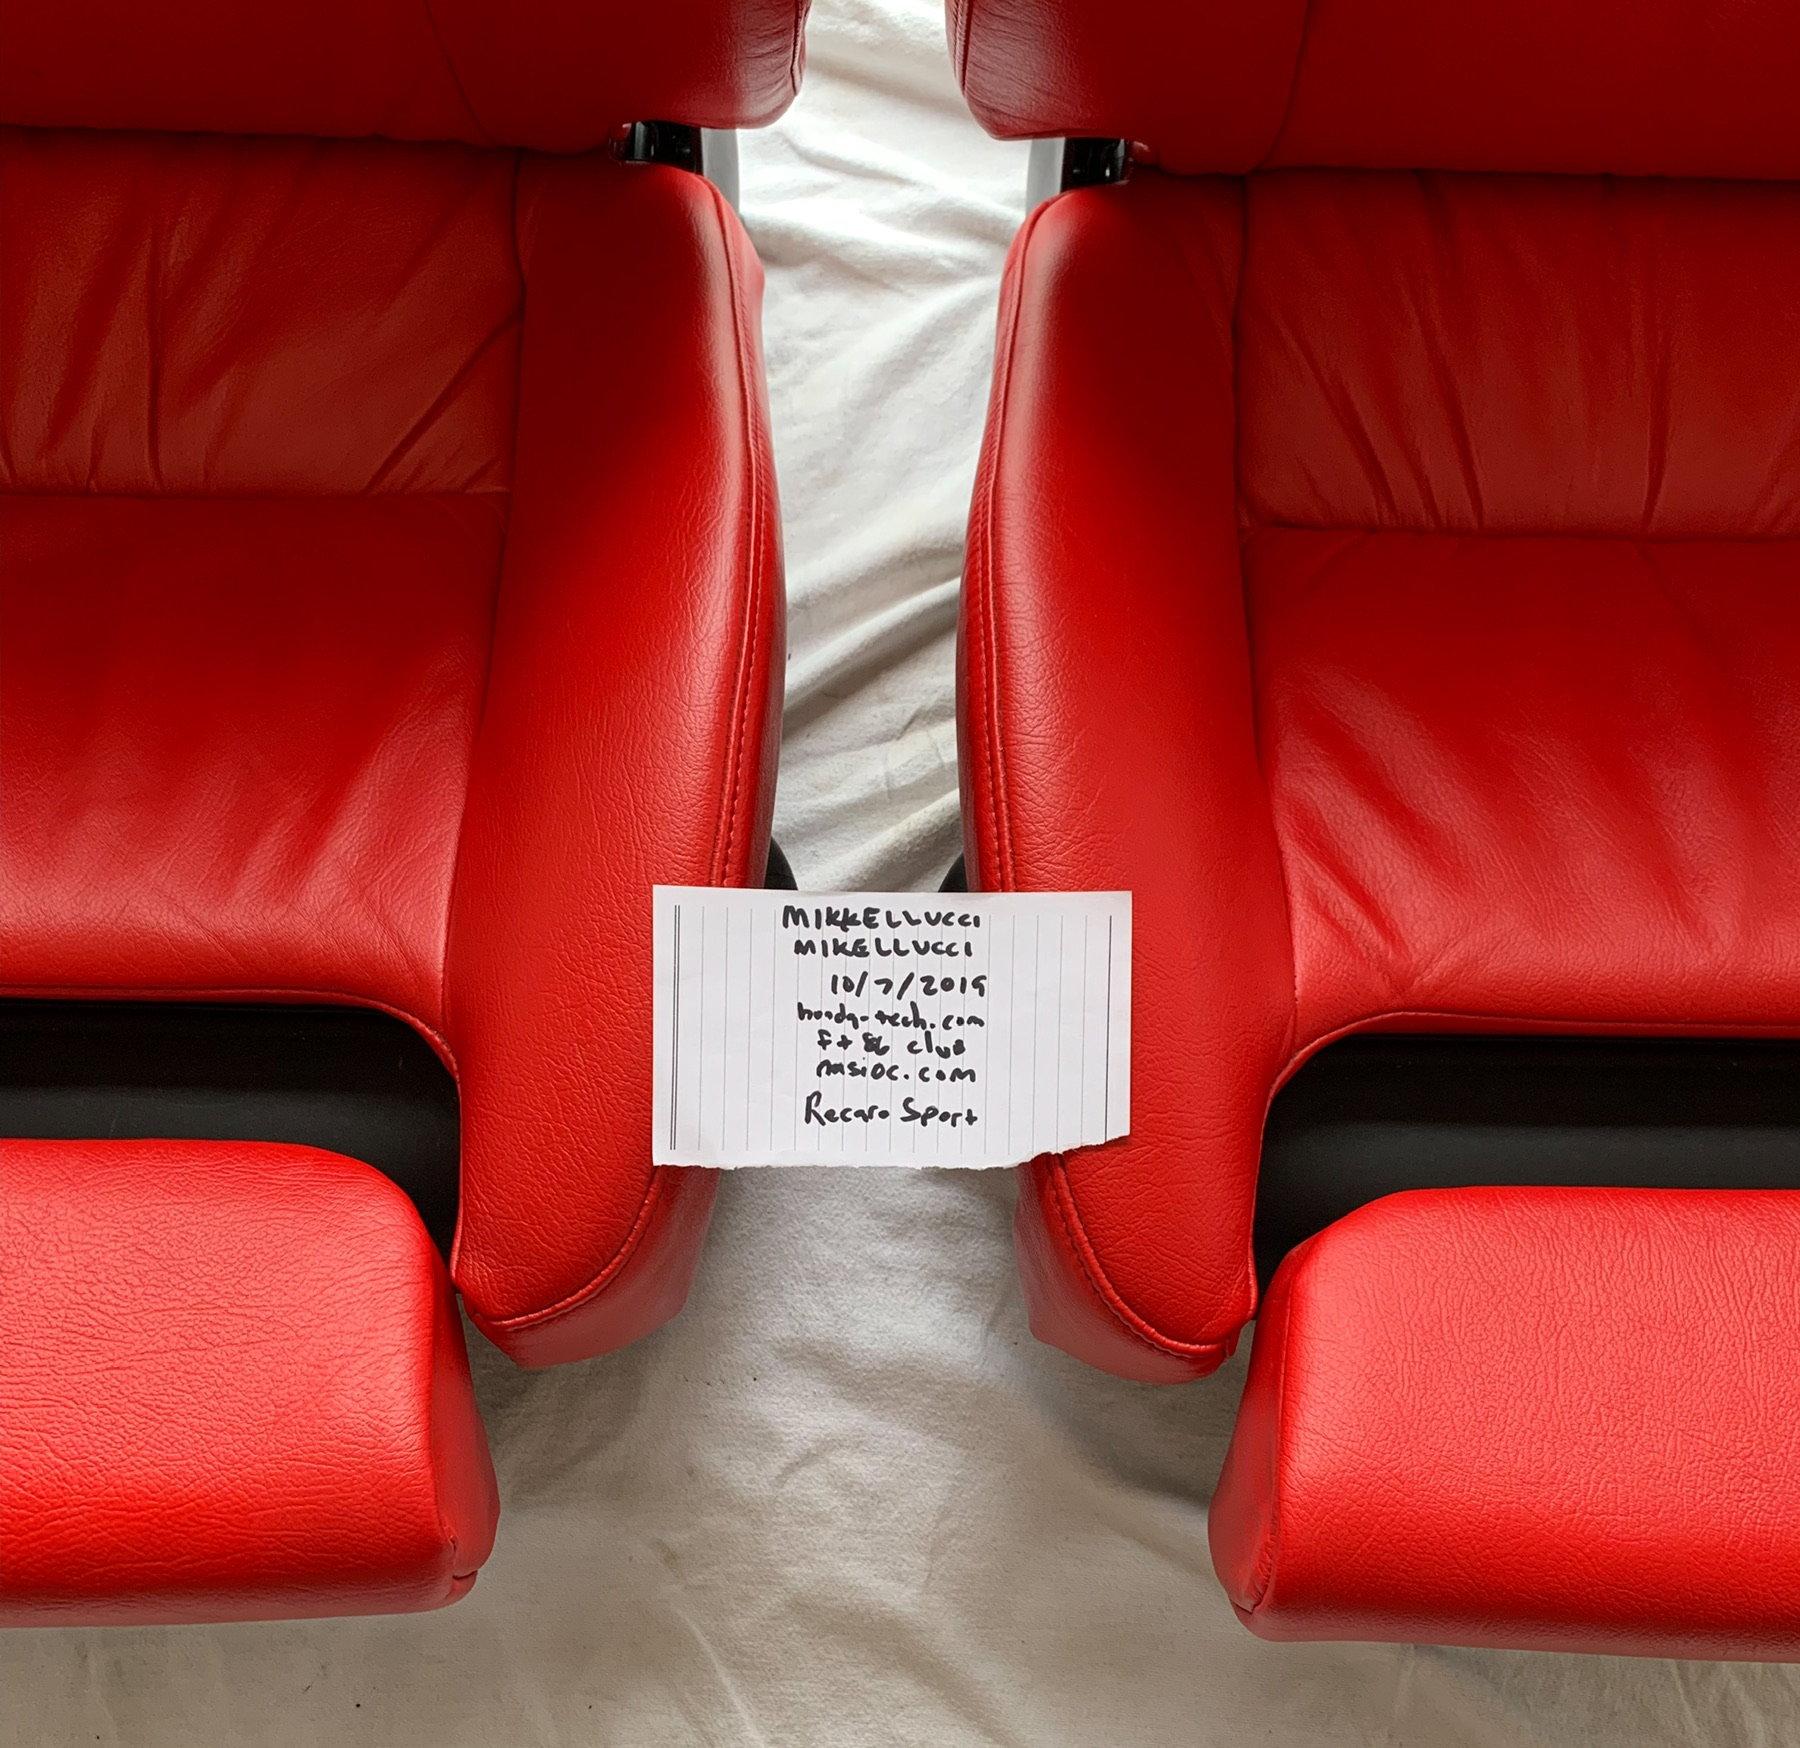 Fs Recaro Sport Topline Seats Honda Tech Honda Forum